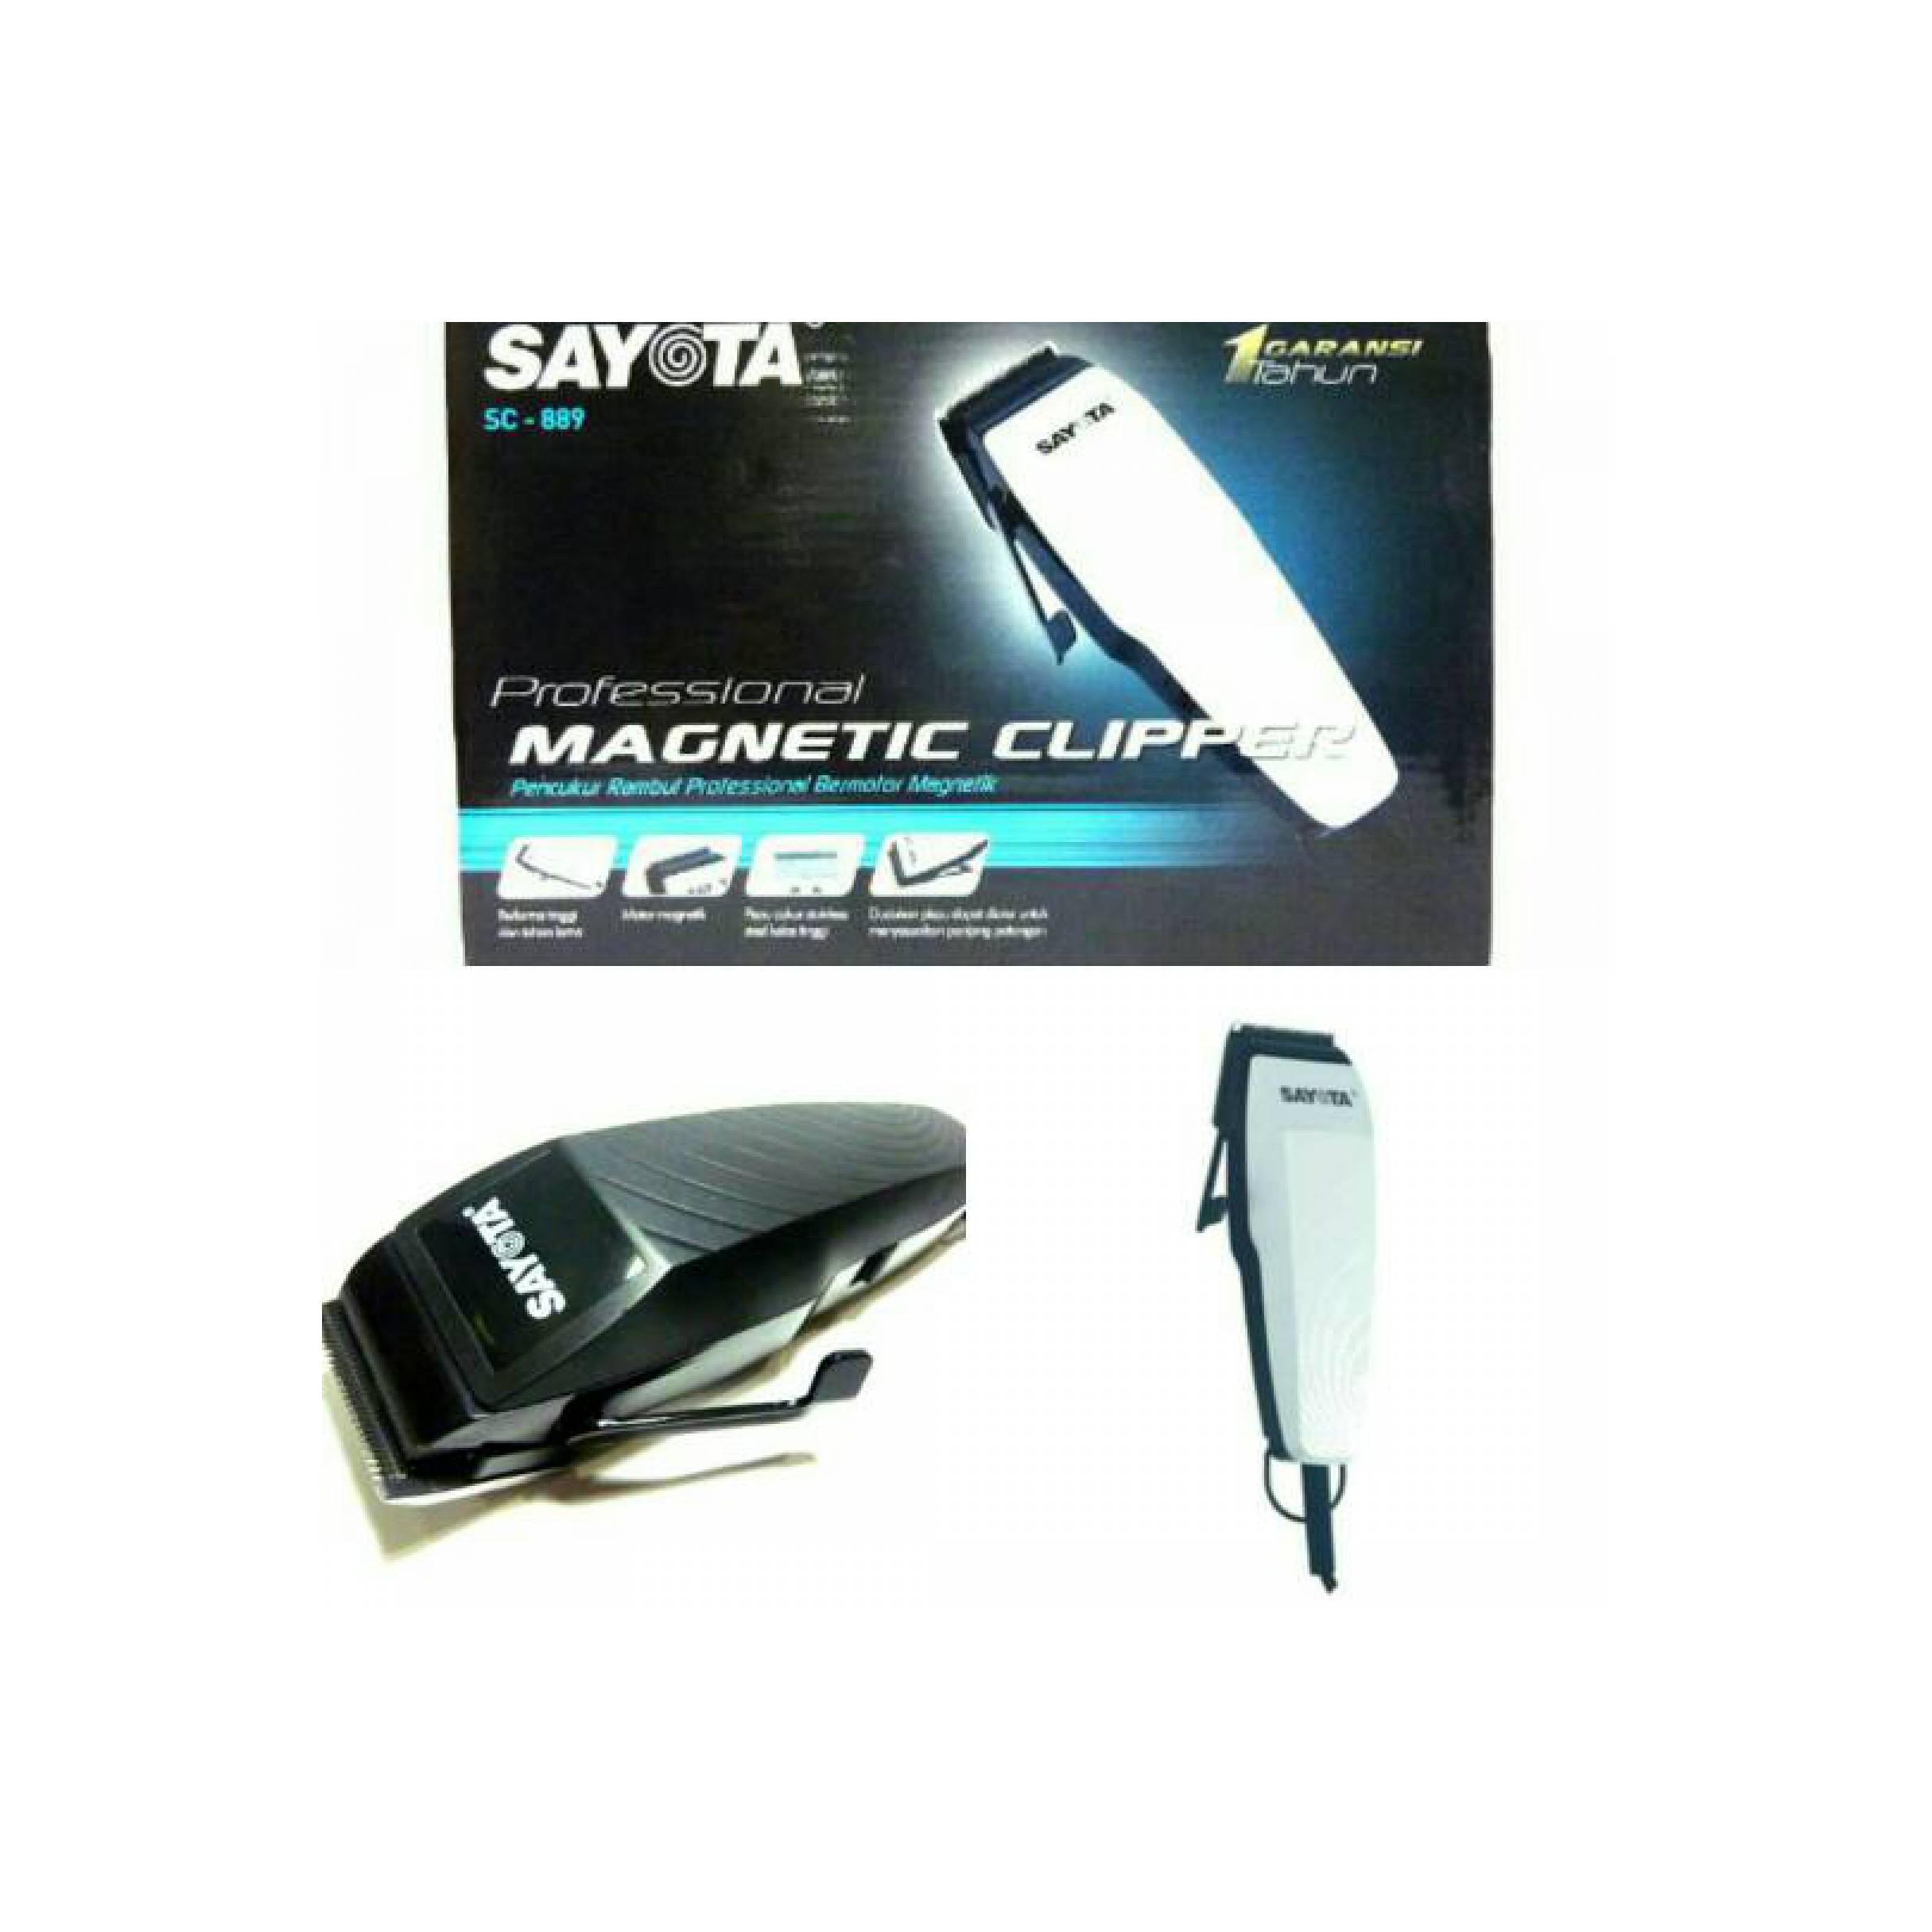 ... Home Sayota Sc 889 Magnetic Clipper Profesional ALAT CUKUR RAMBUT SAYOTA S 889